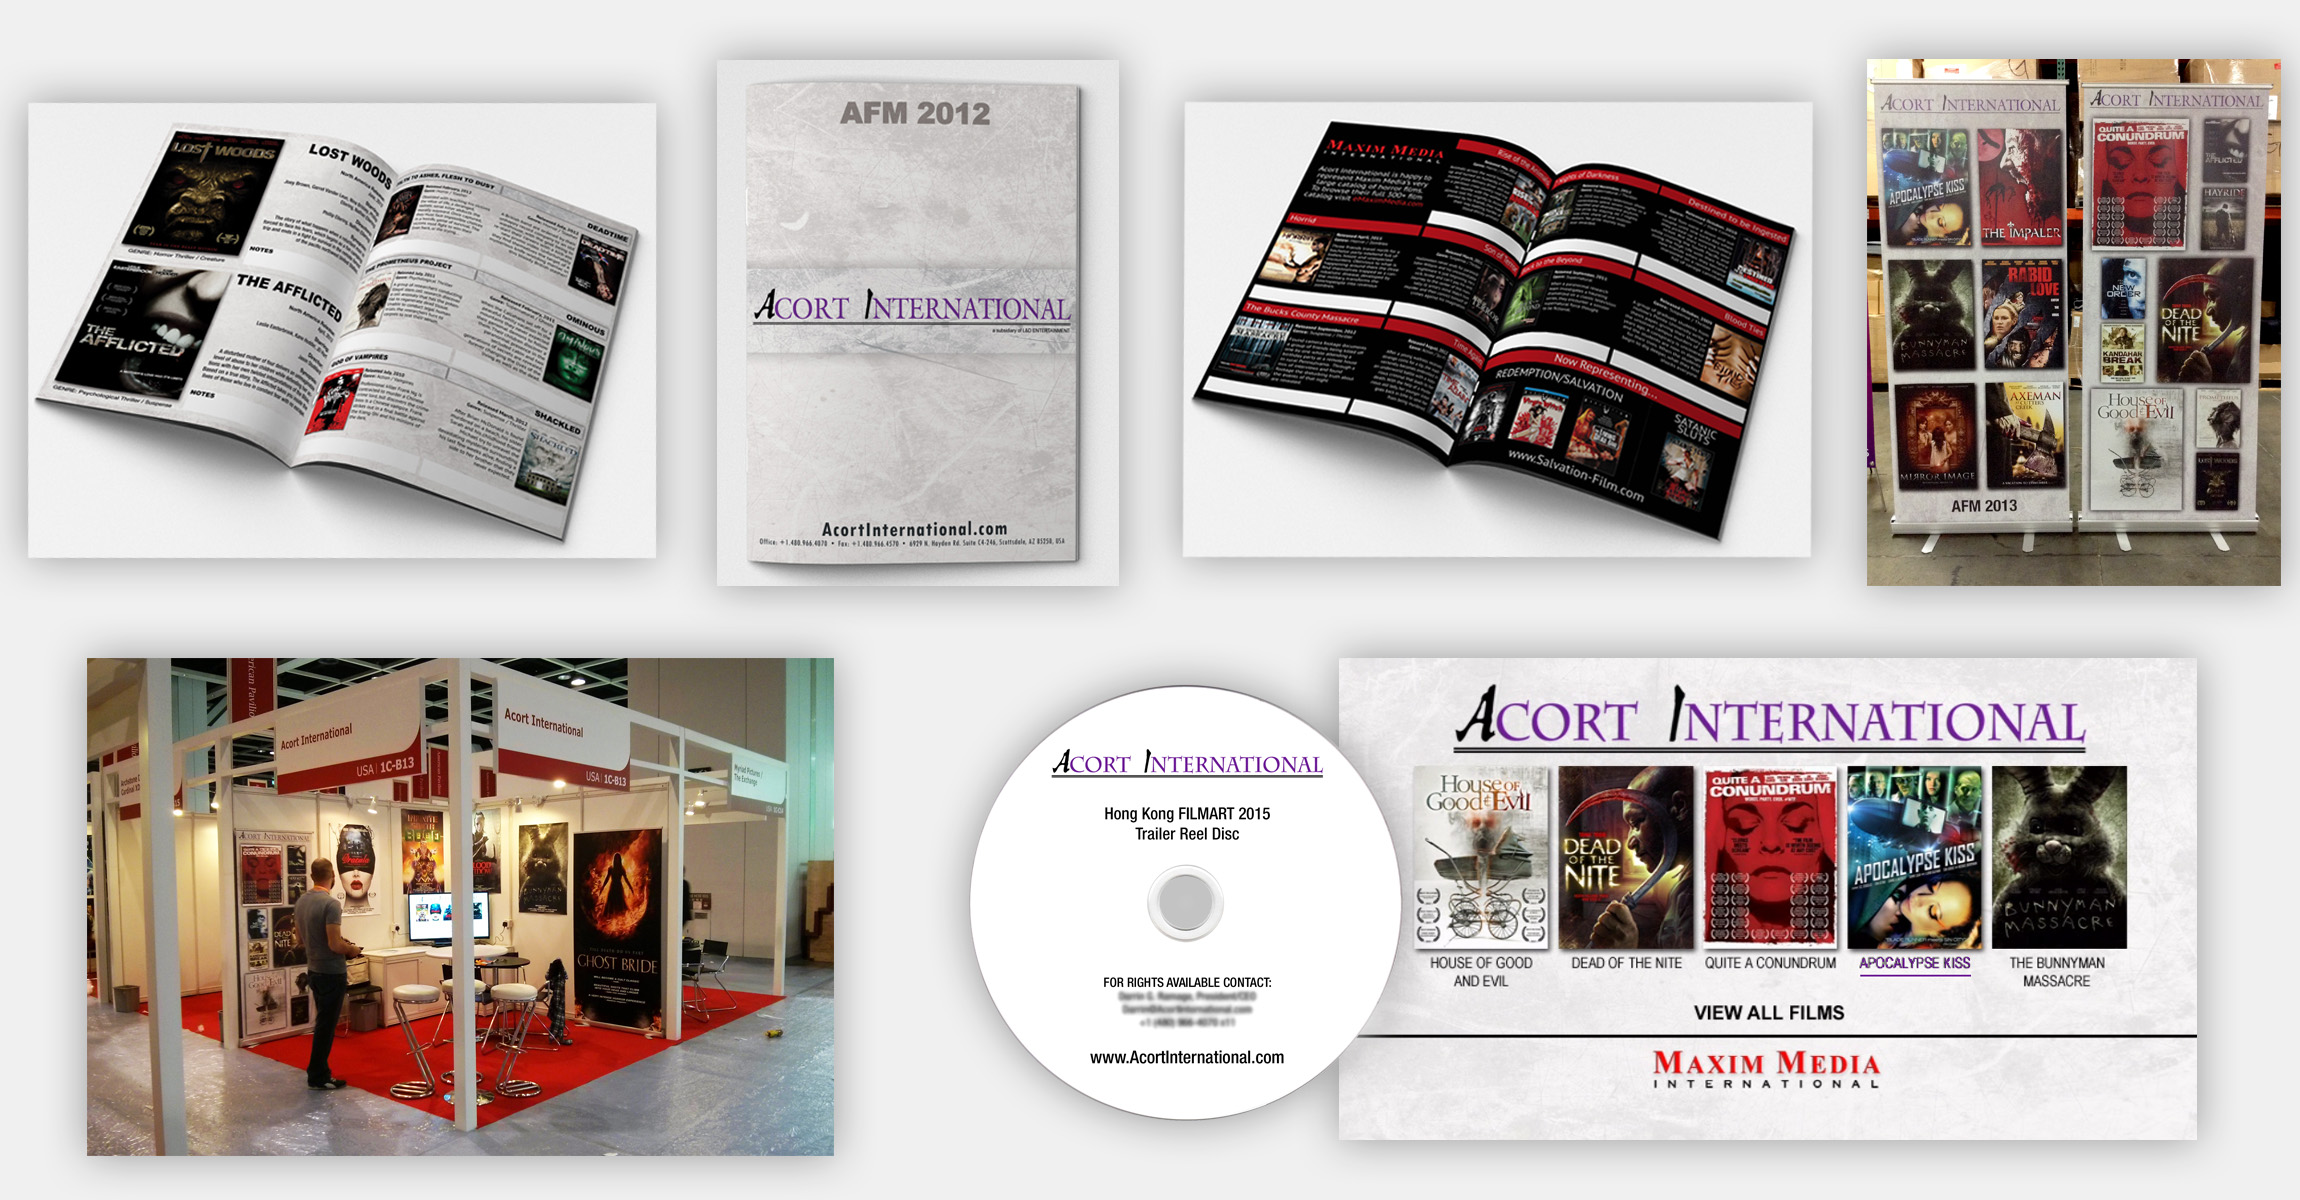 Acort International Film Market Materials